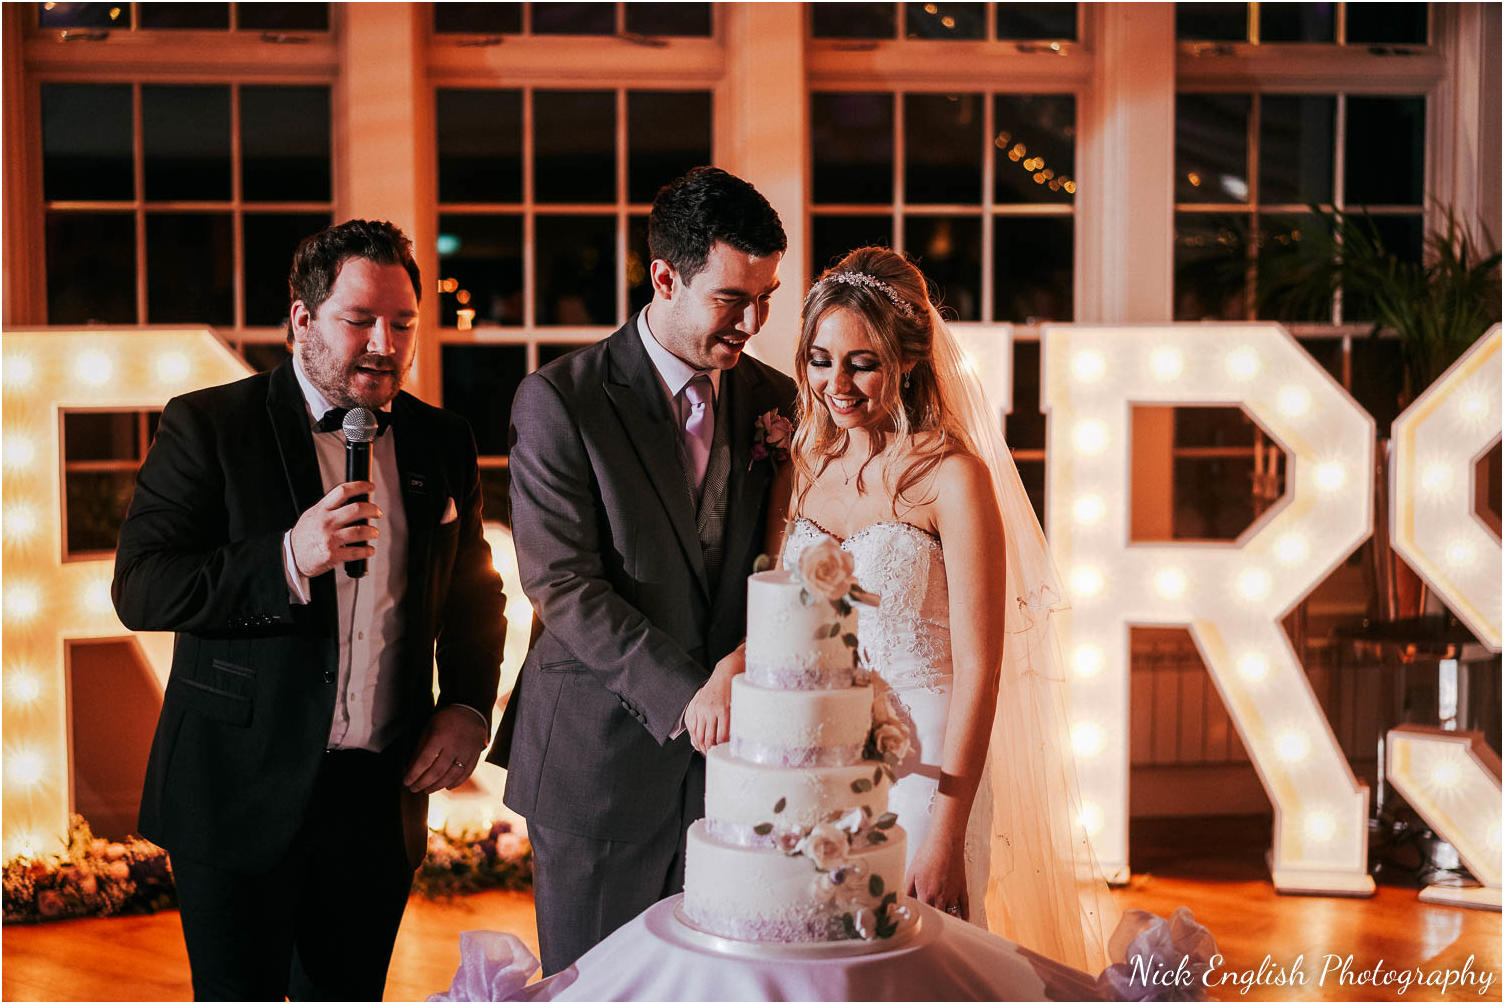 Mitton_Hall_Wedding_Photographer_2018-167.jpg